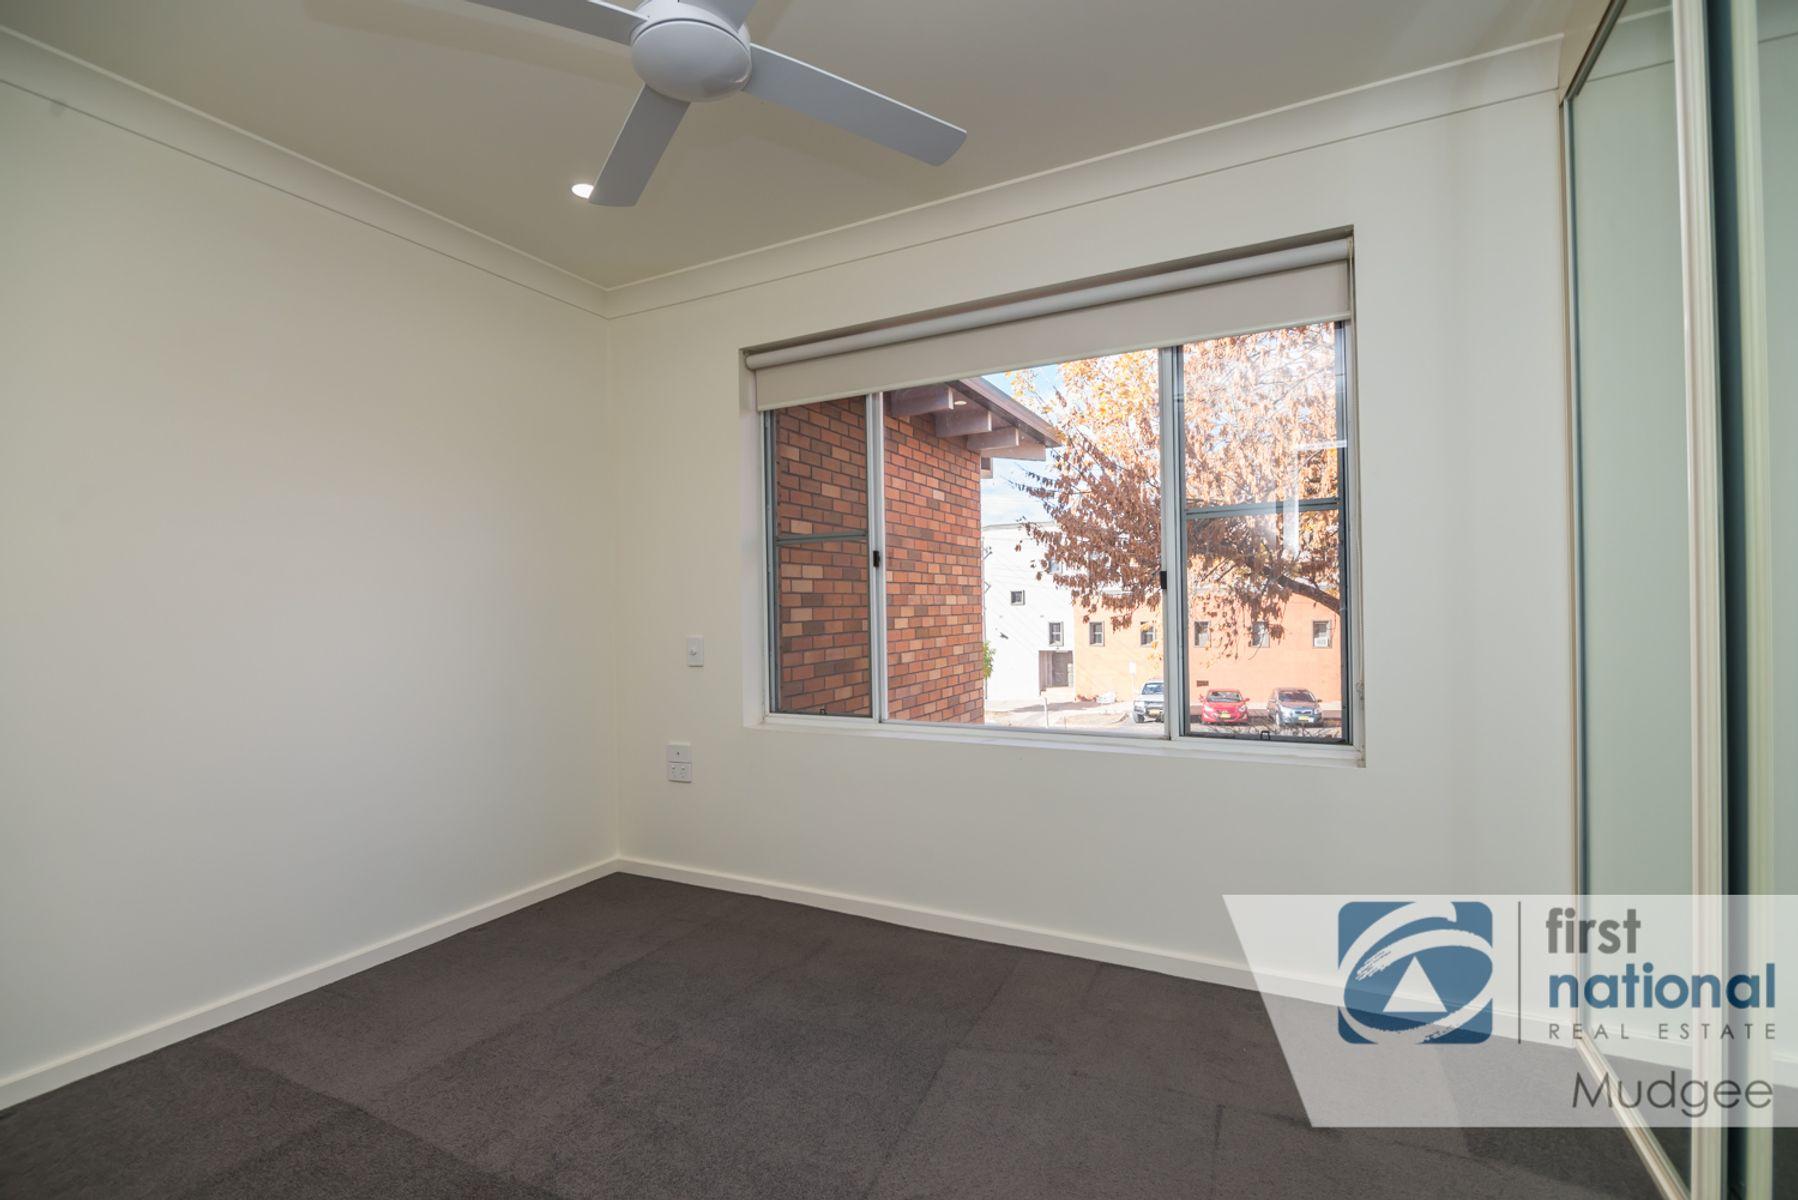 5/99a Mortimer Street, Mudgee, NSW 2850